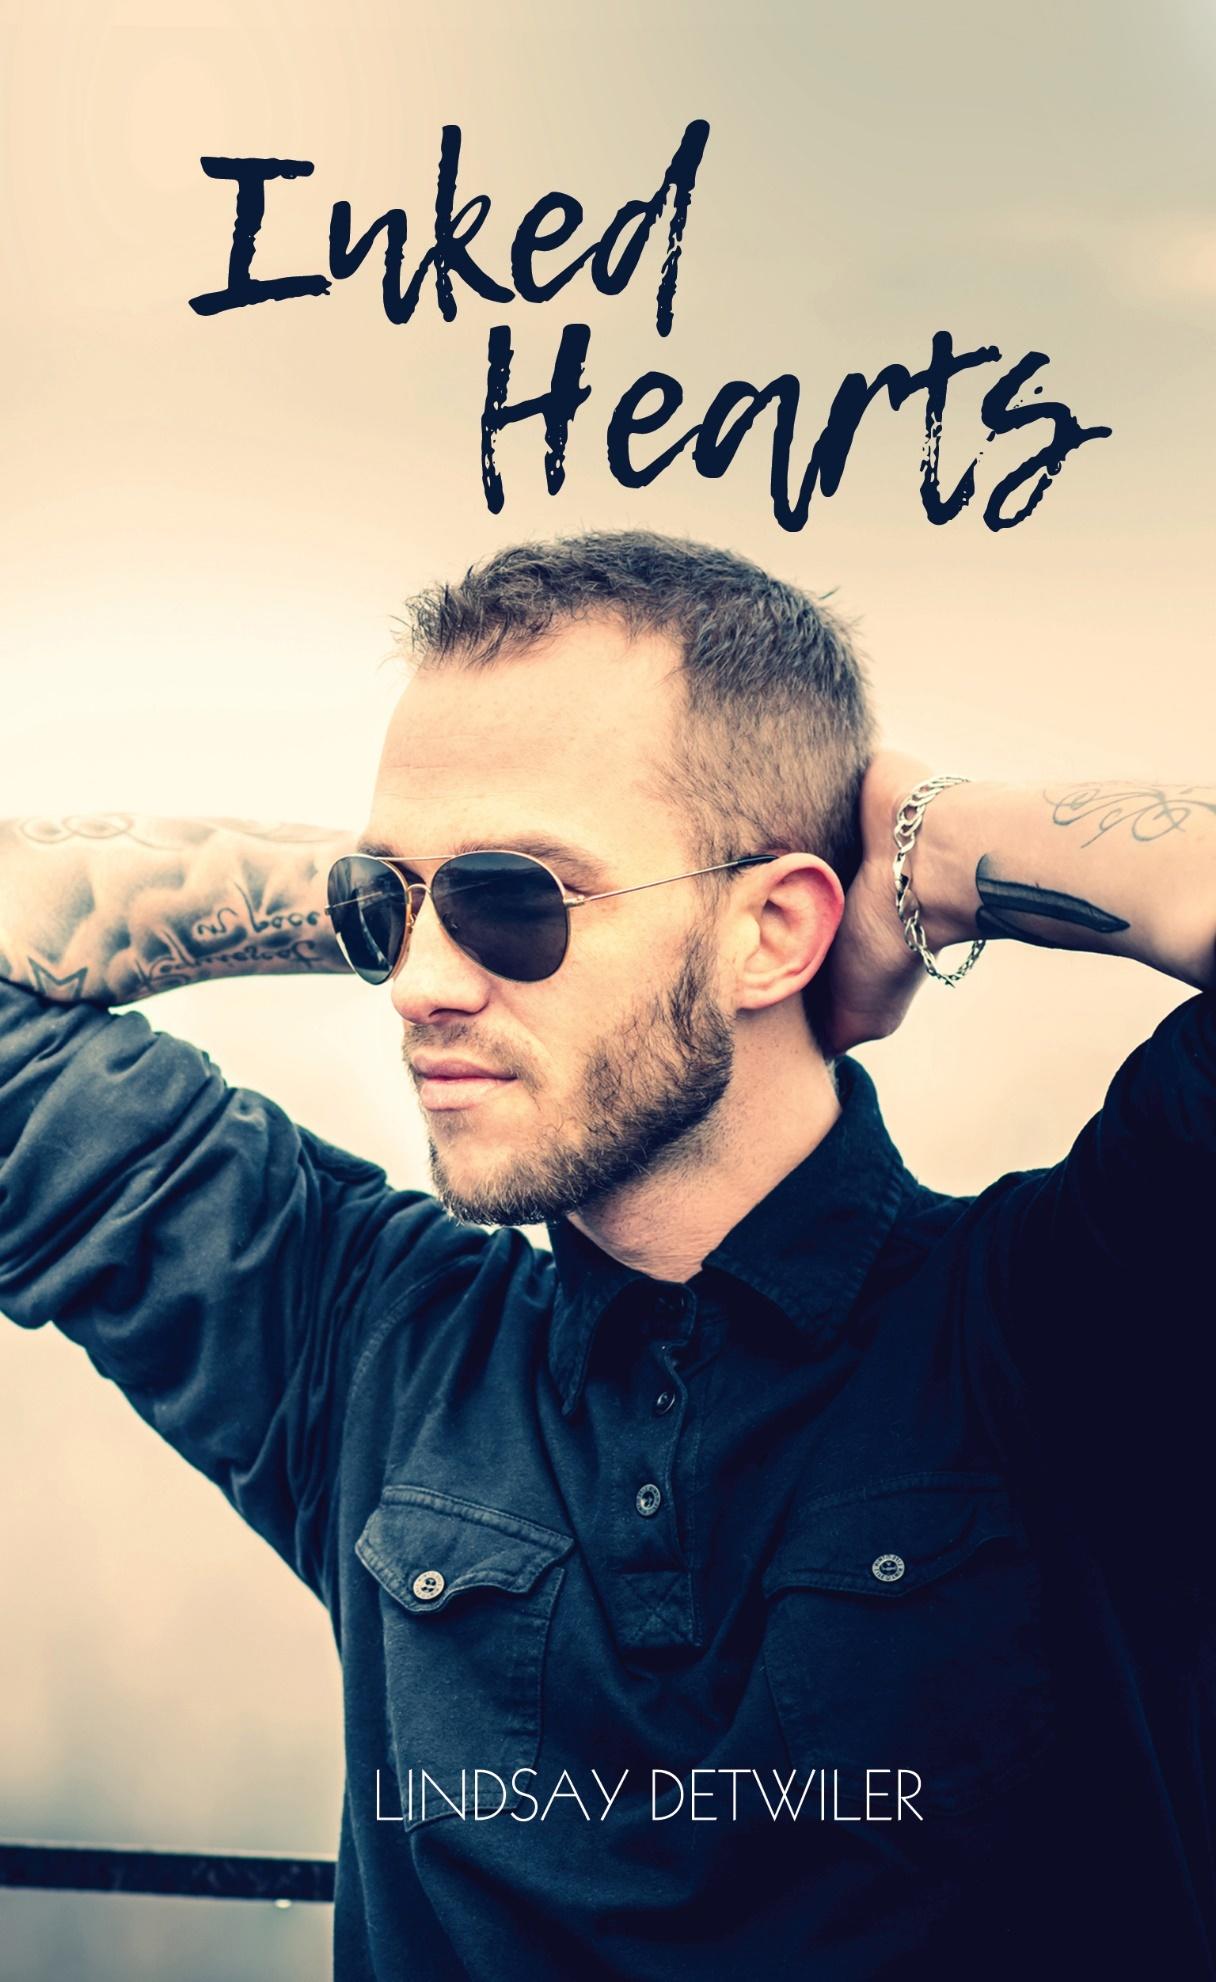 Epub Inked Hearts by Lindsay Detwiler